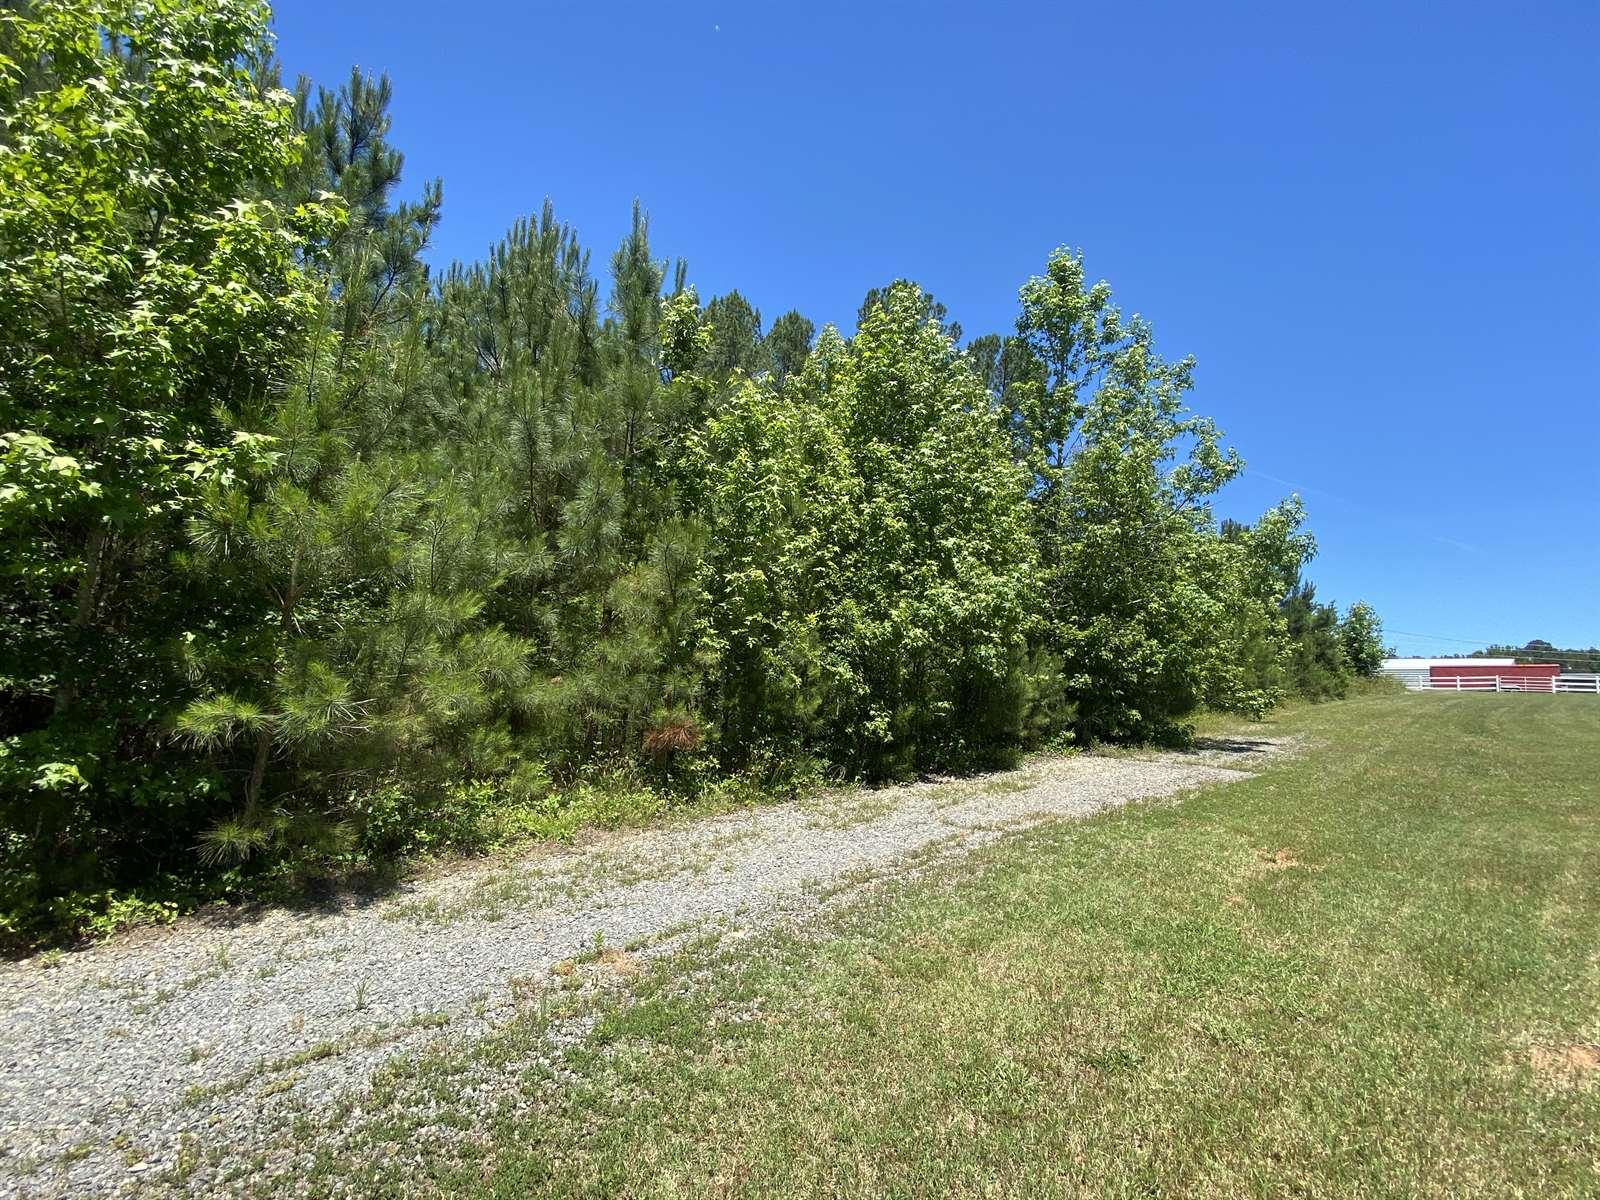 Lot 26-E Wagon Drive, Bracey, VA 23919